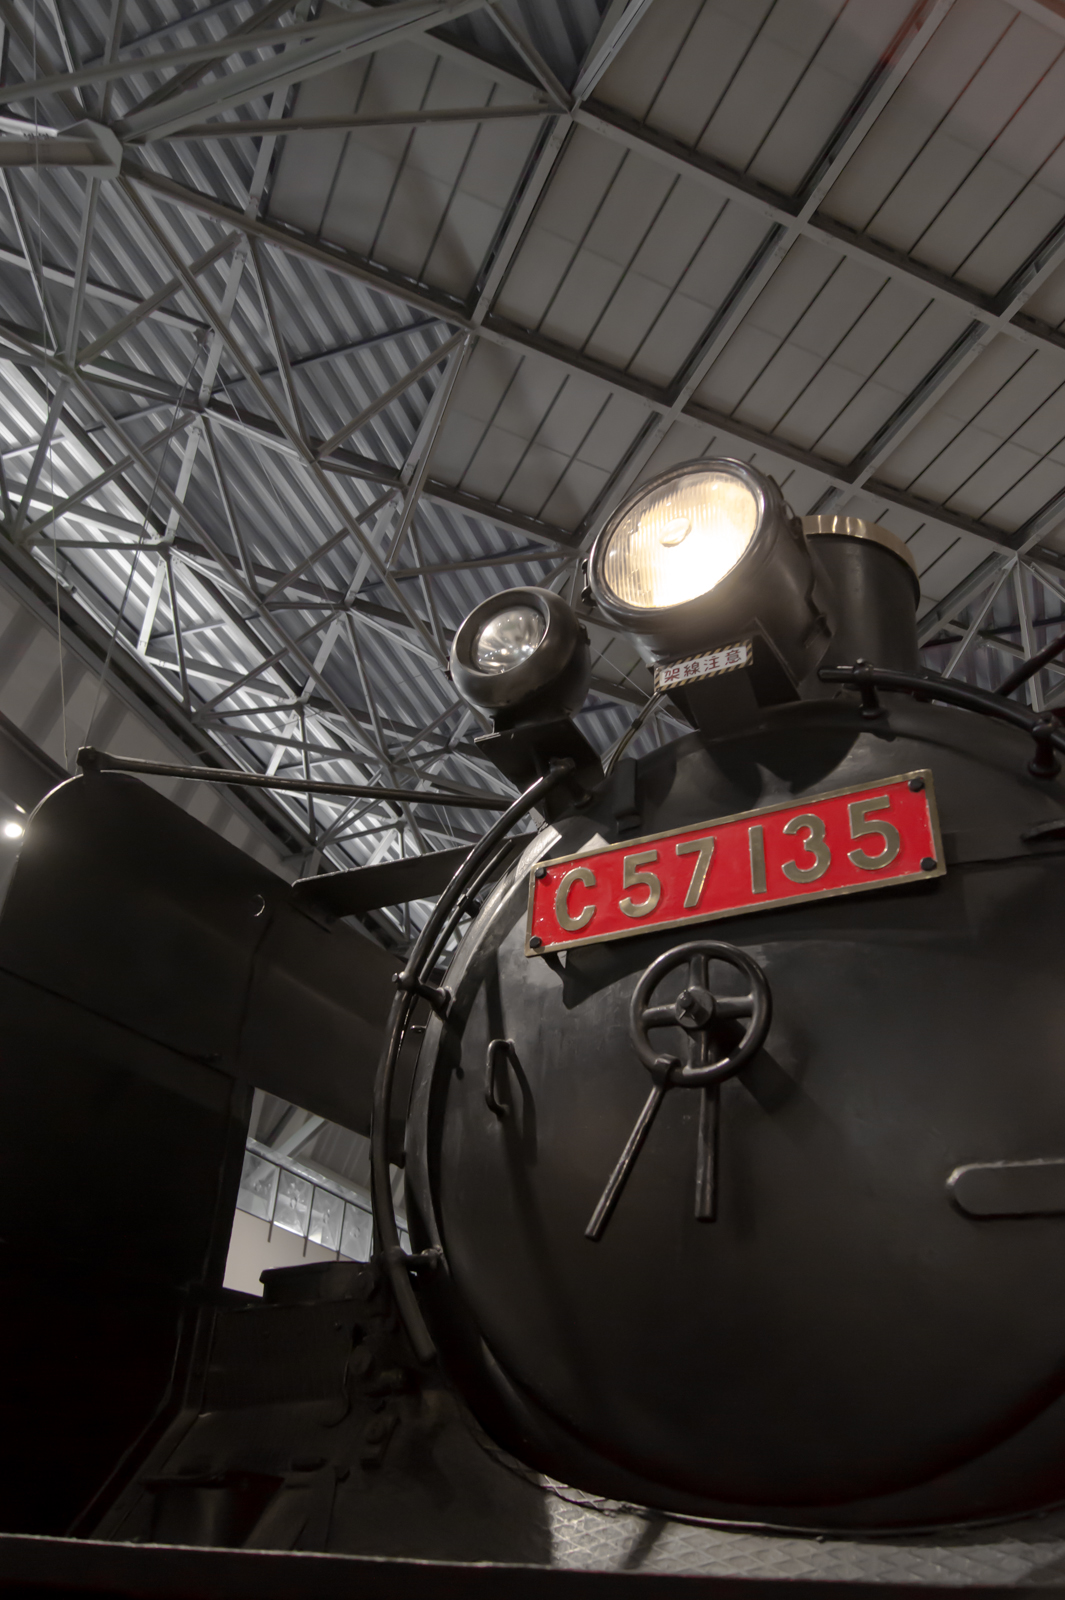 C57形式蒸気機関車 車号C57135の写真 (1940年製造)